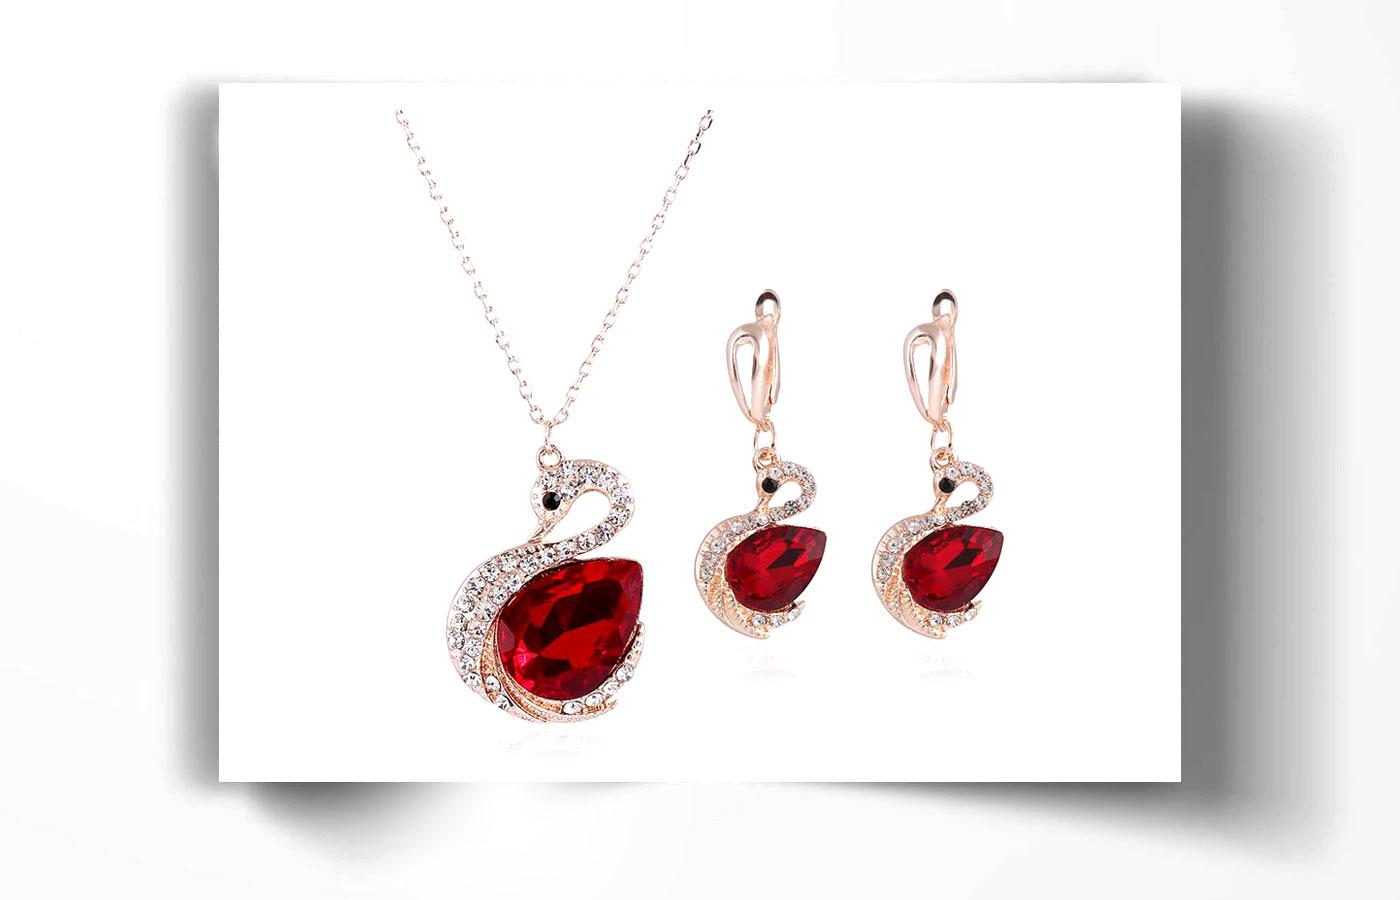 Ruby in Feng Shui 17a - رمز و رازهای یاقوت سرخ در فنگ شویی